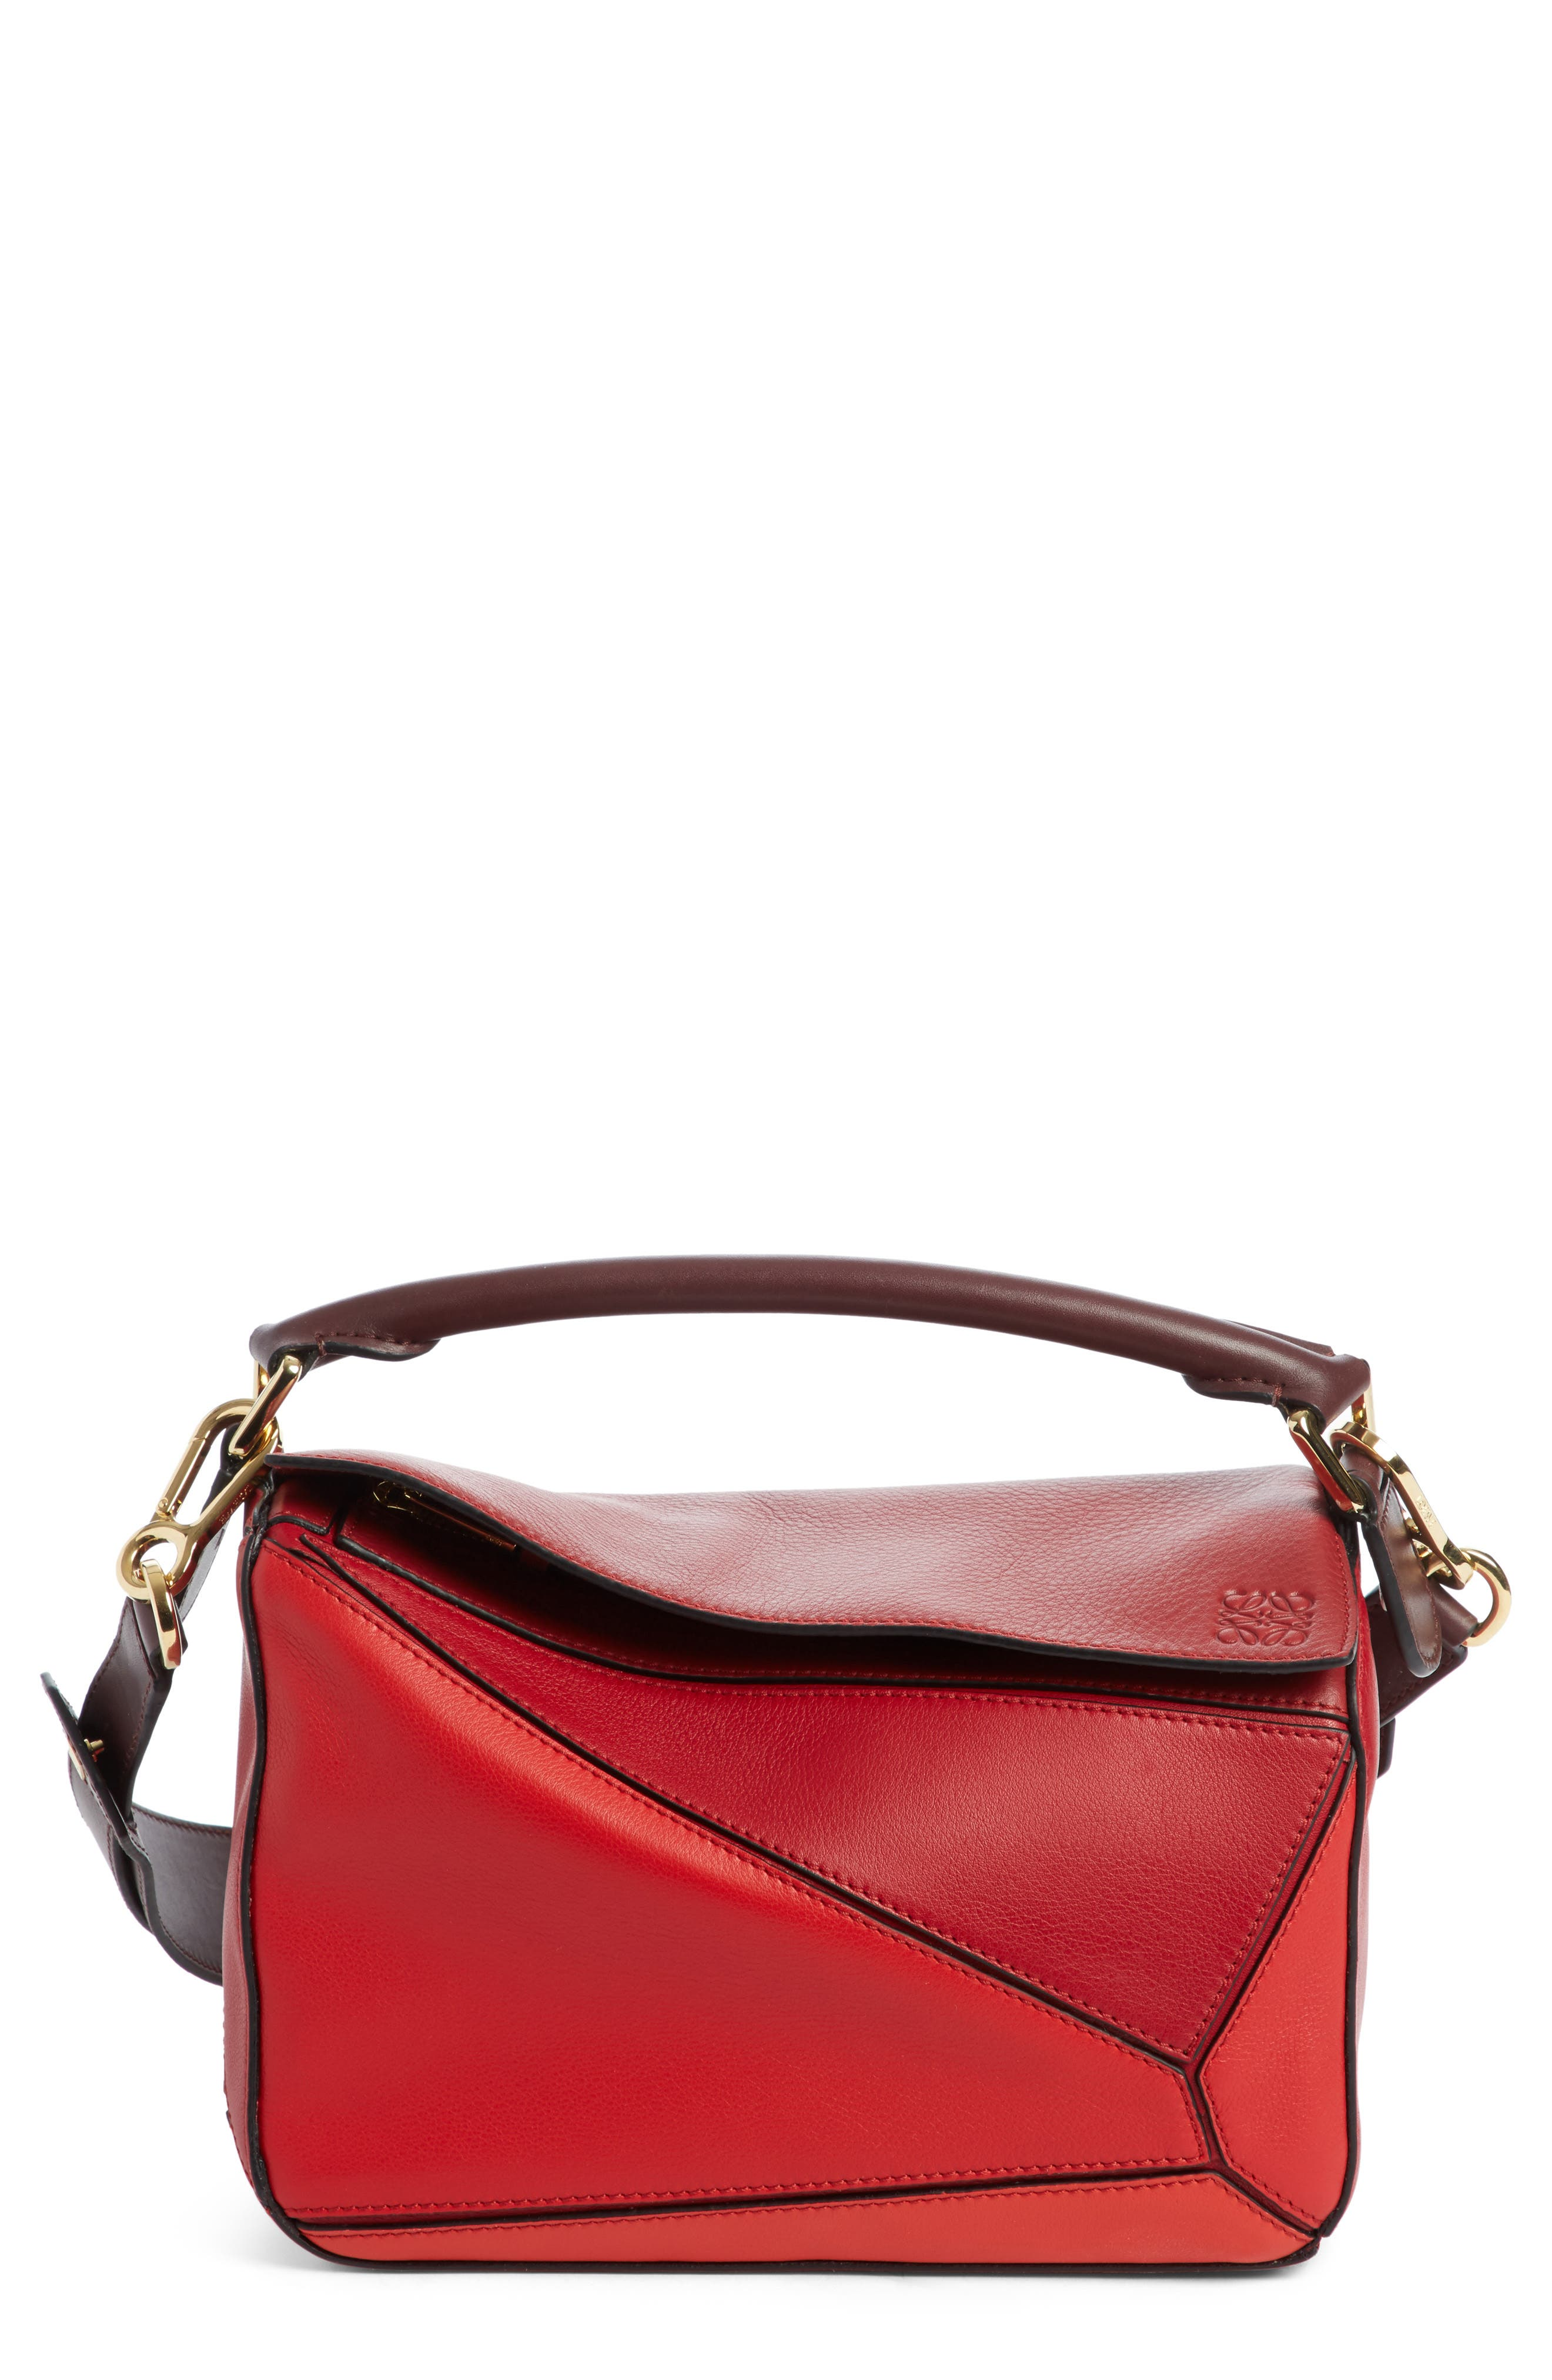 Main Image - Loewe Small Colorblock Puzzle Bag